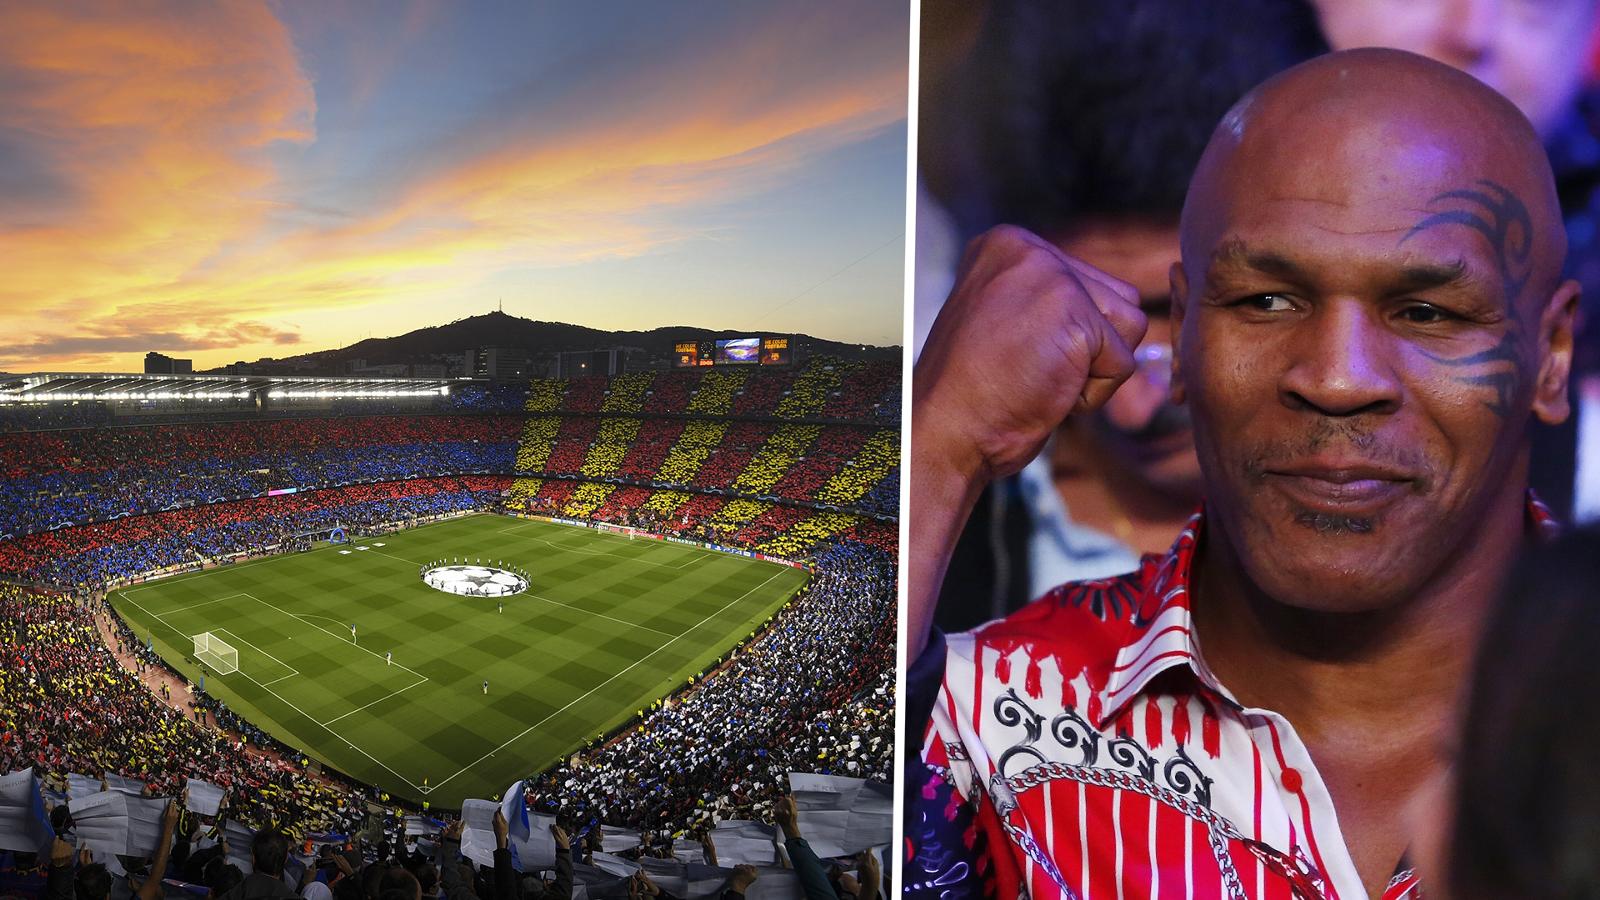 Perusahaan Ganja Mike Tyson Tertarik Beli Nama Camp Nou Barcelona